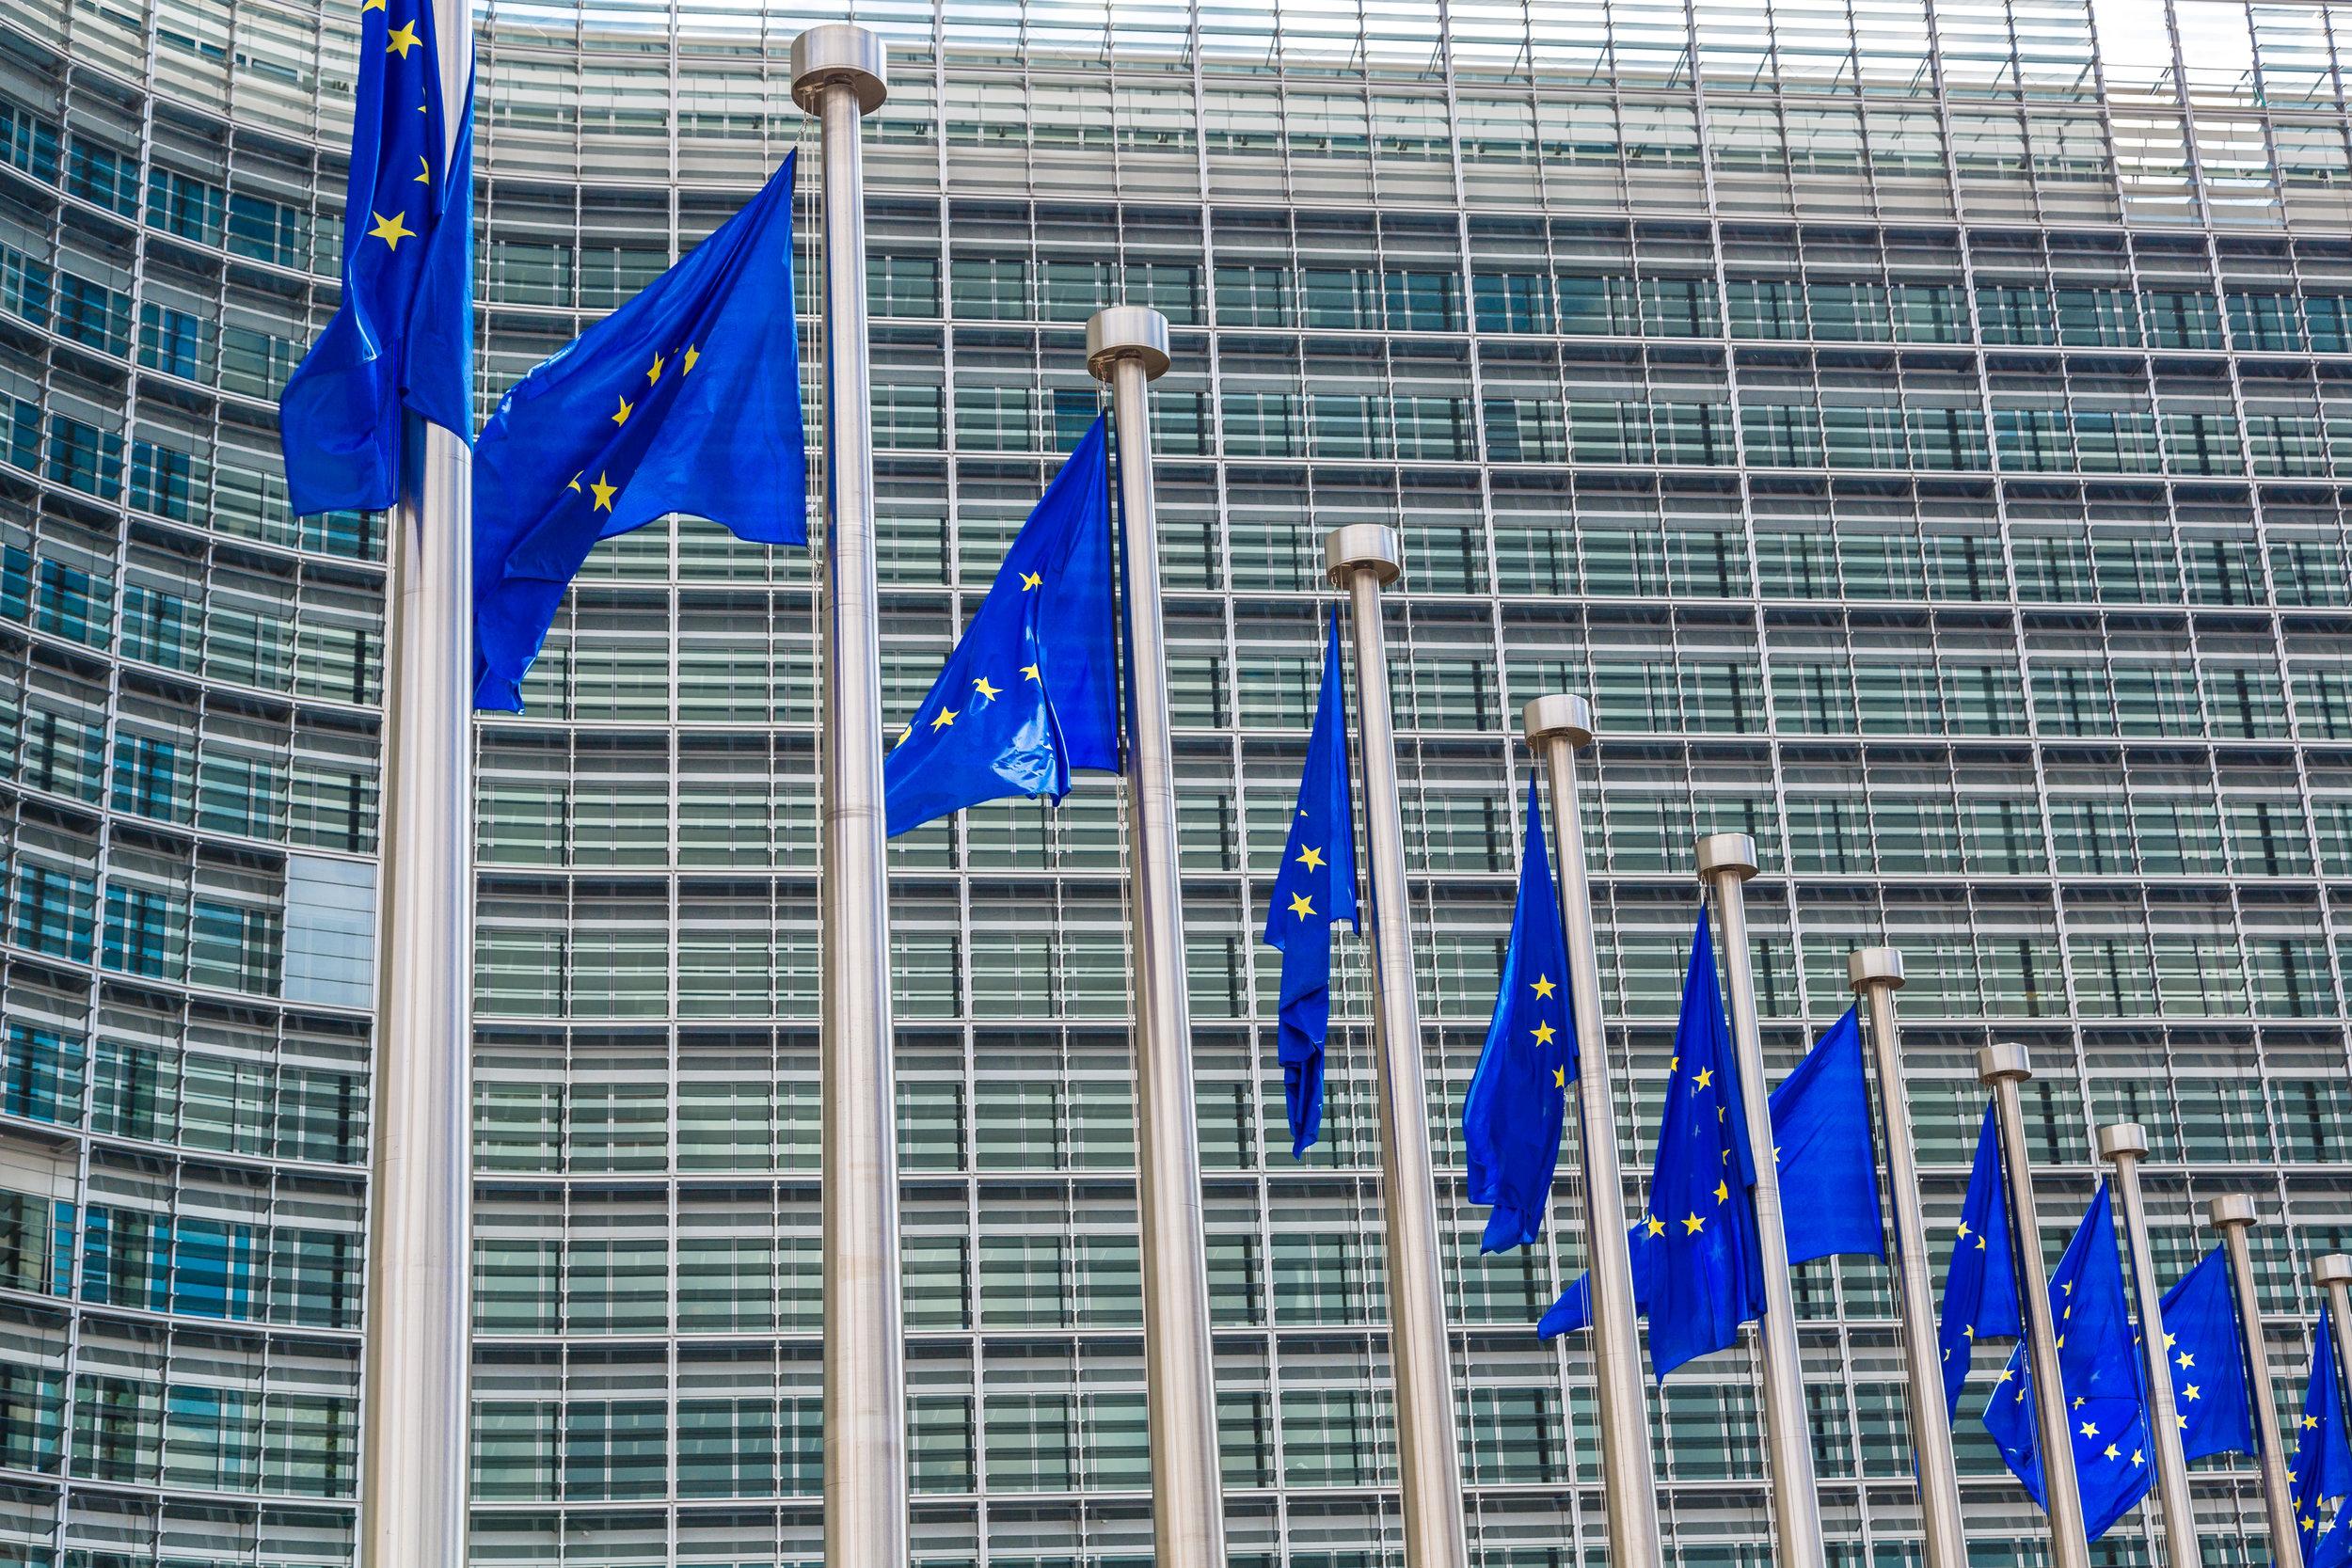 Copy of European flags  in Brussels